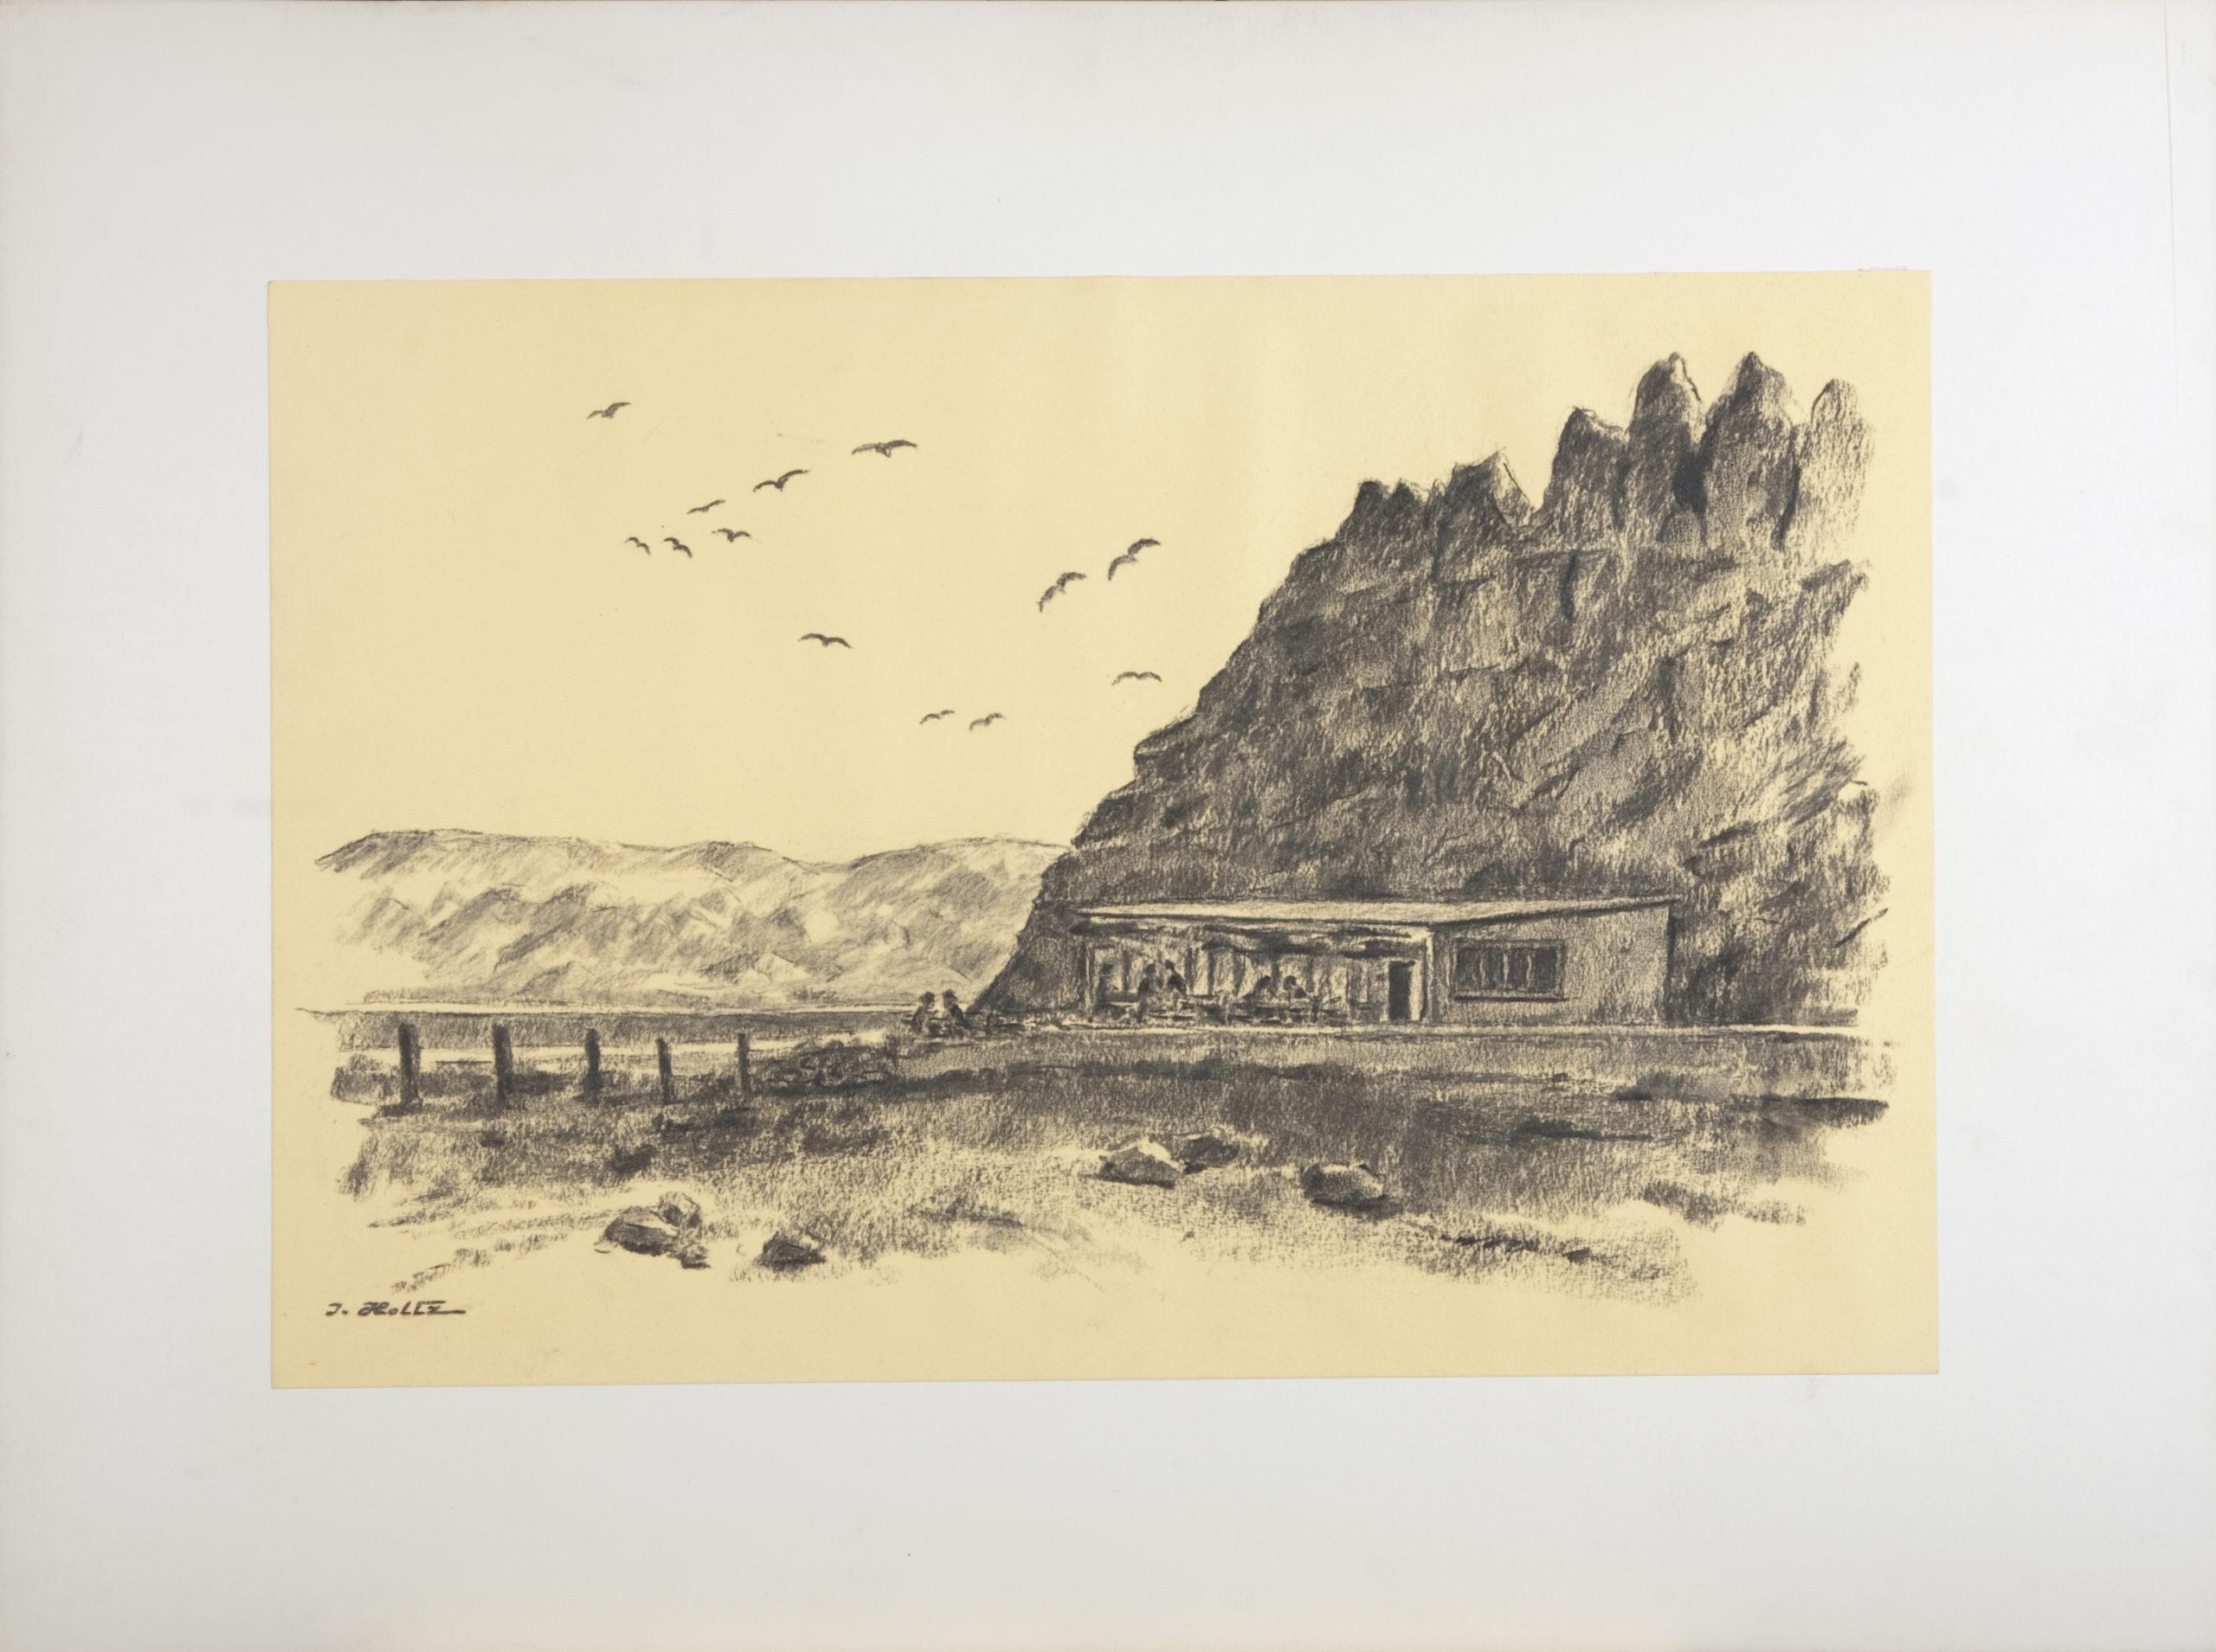 222 Dessert Roadside Stand 1959 - Charcoal - 18 x 12 - No Frame